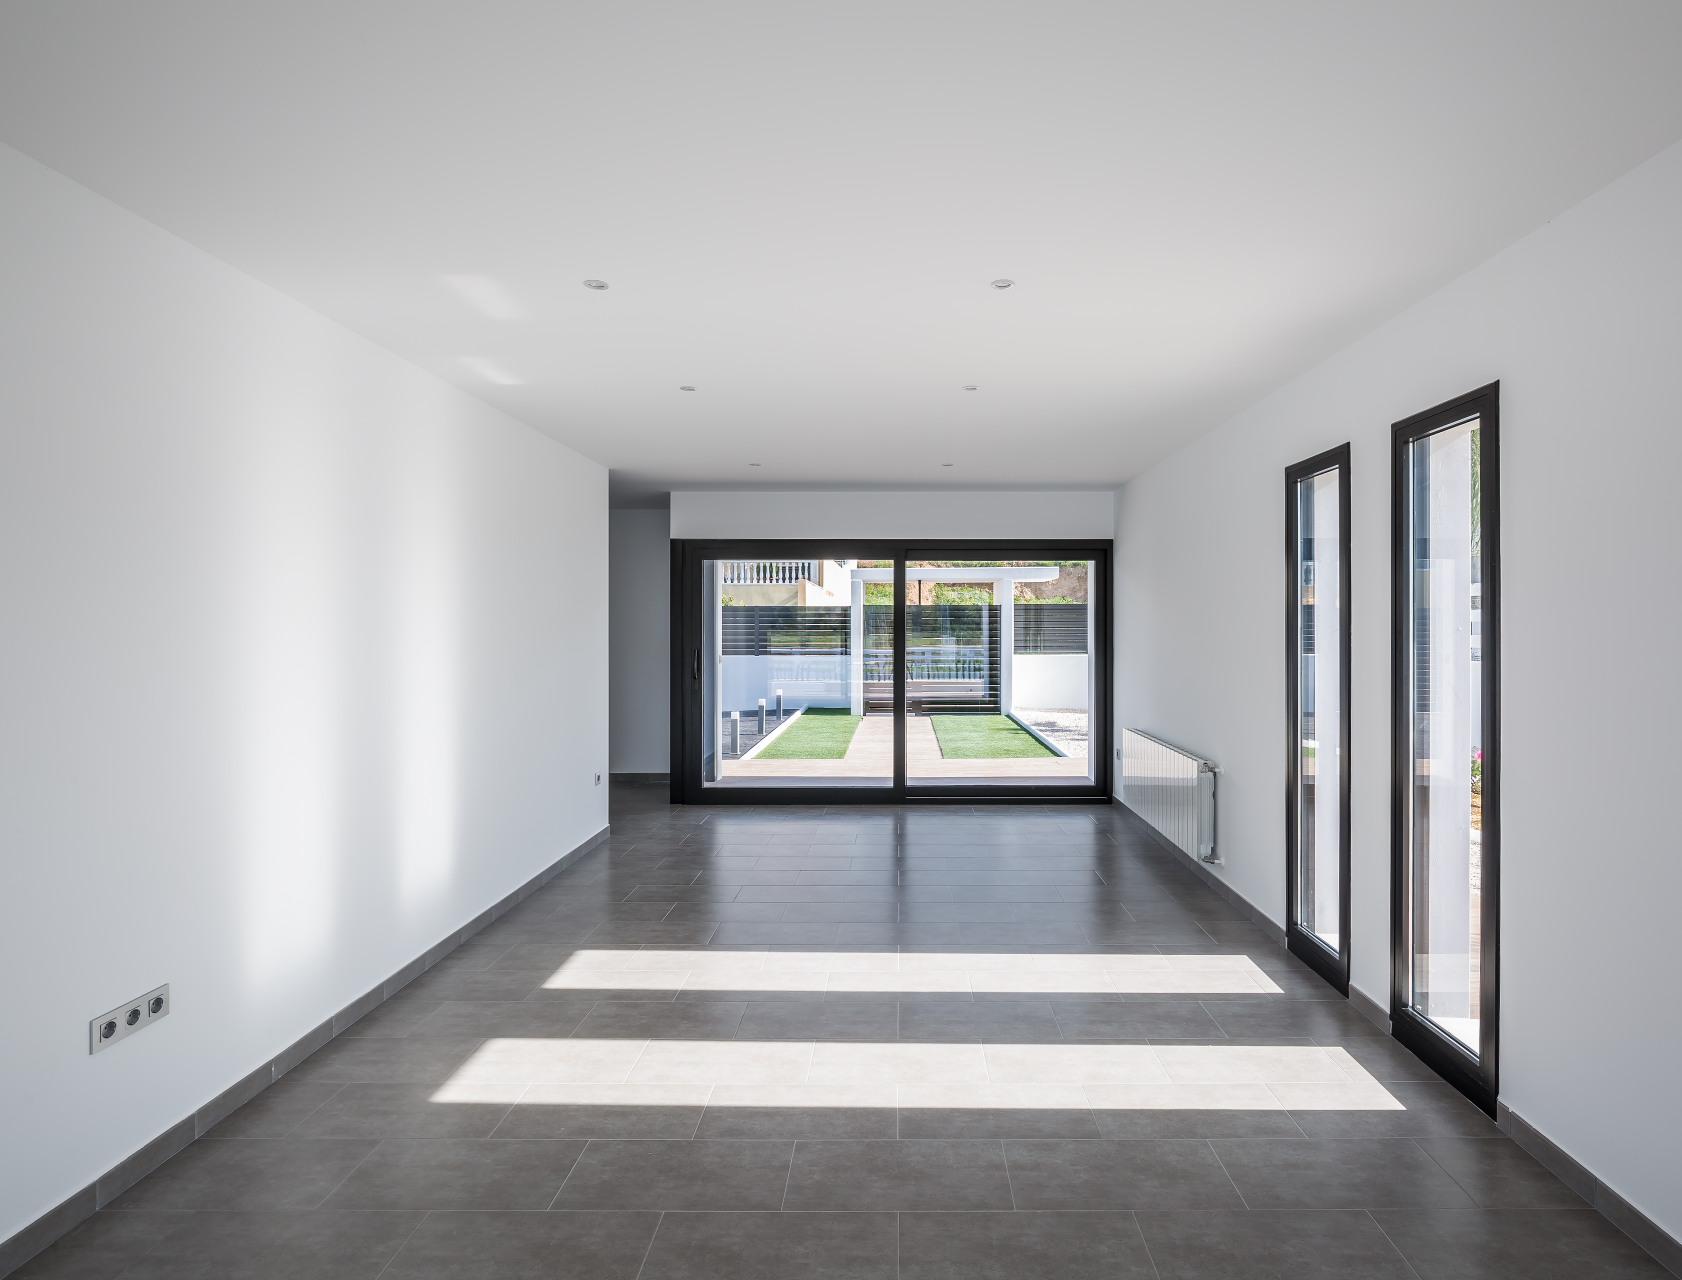 fotografia-arquitectura-valencia-german-cabo-viraje-vivienda-unifamiliar-calpe (20)